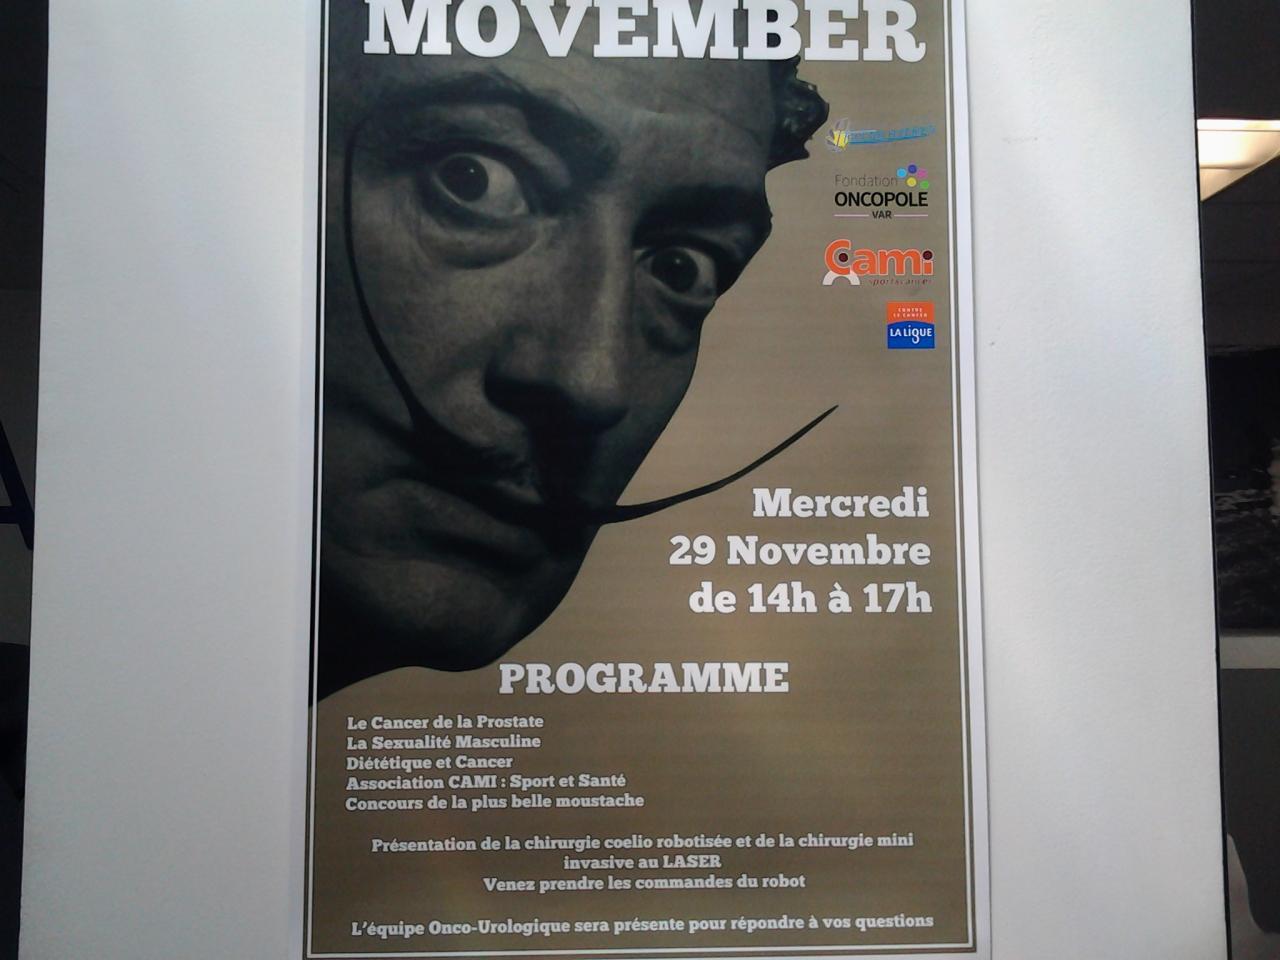 Programme Movember 2017.